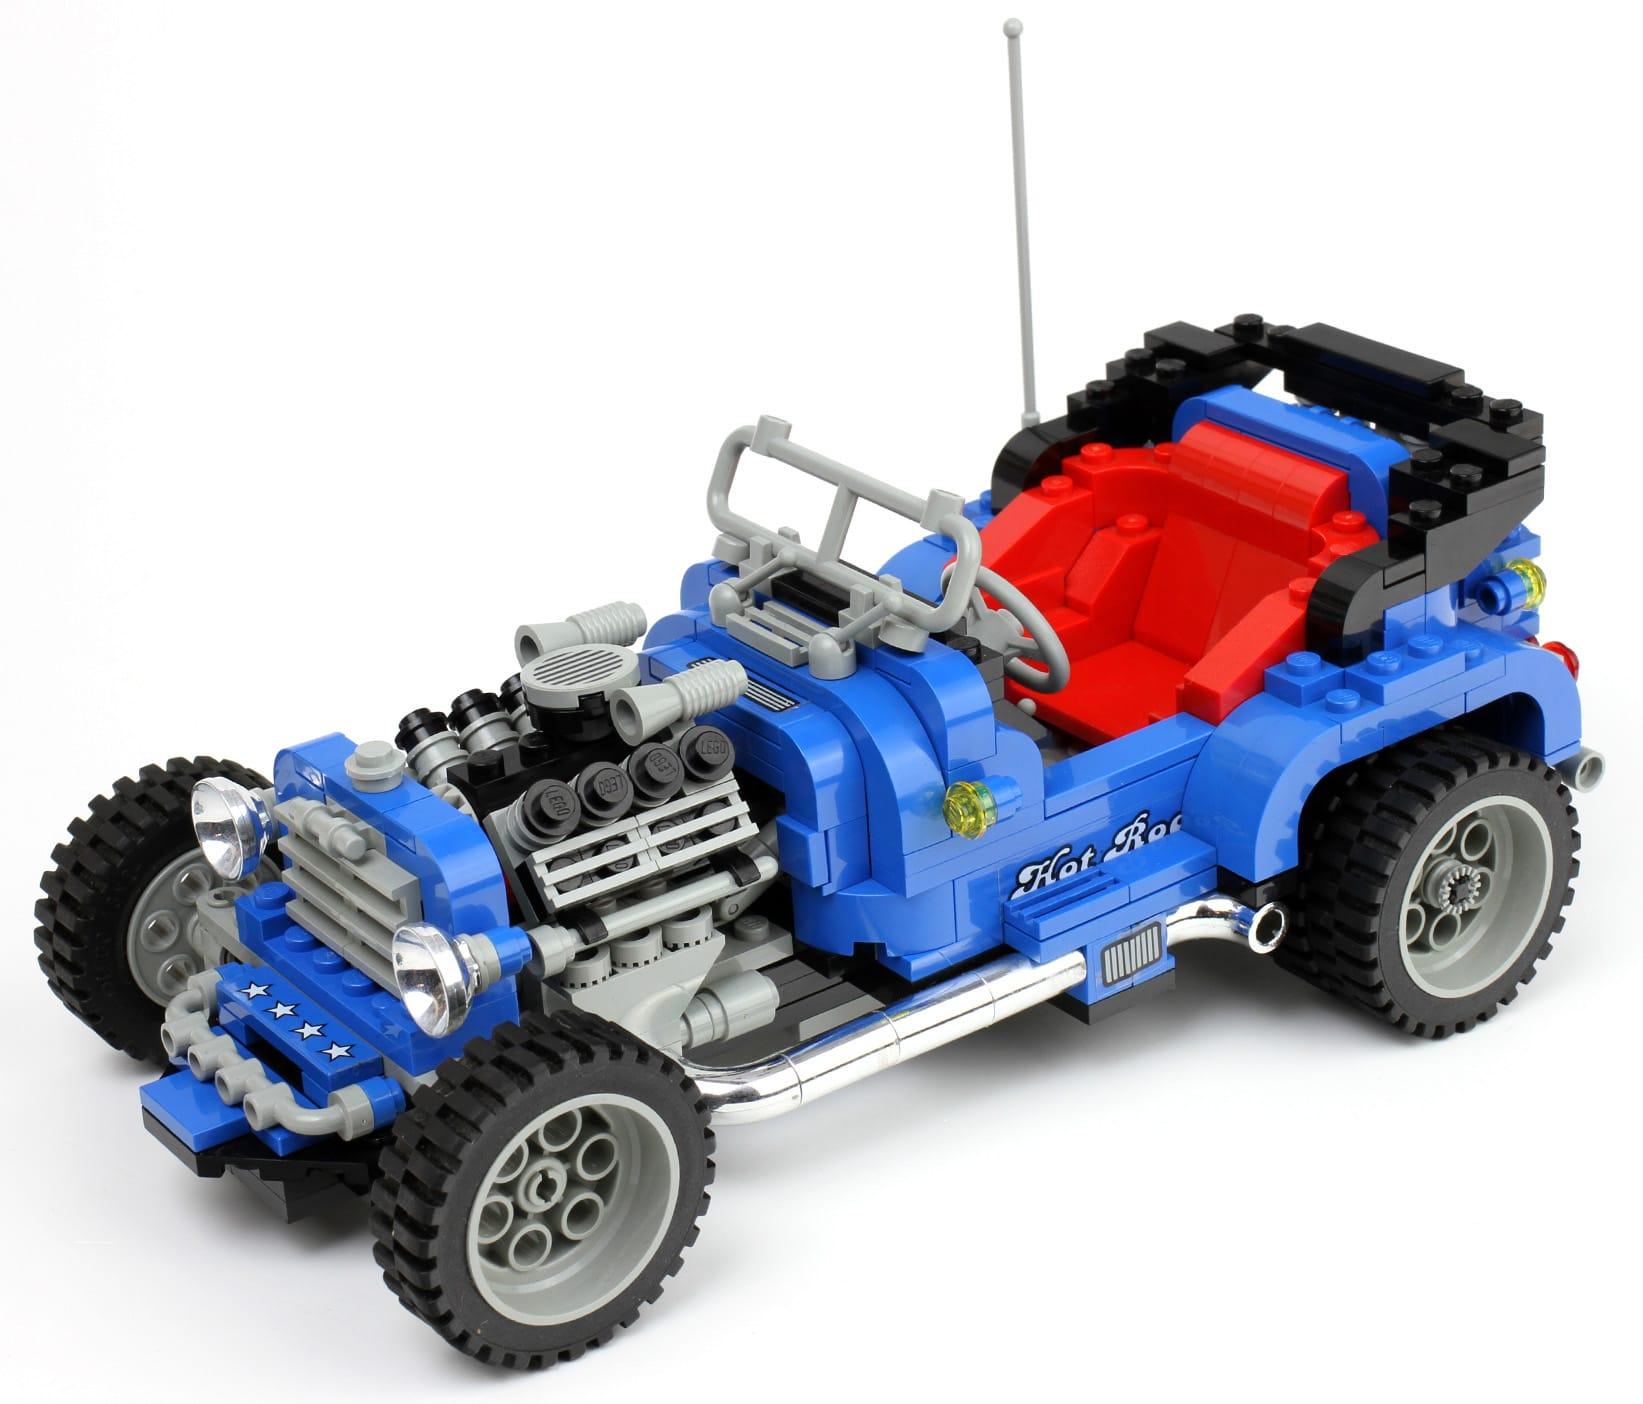 LEGO 5541 Hot Rod Vergleich